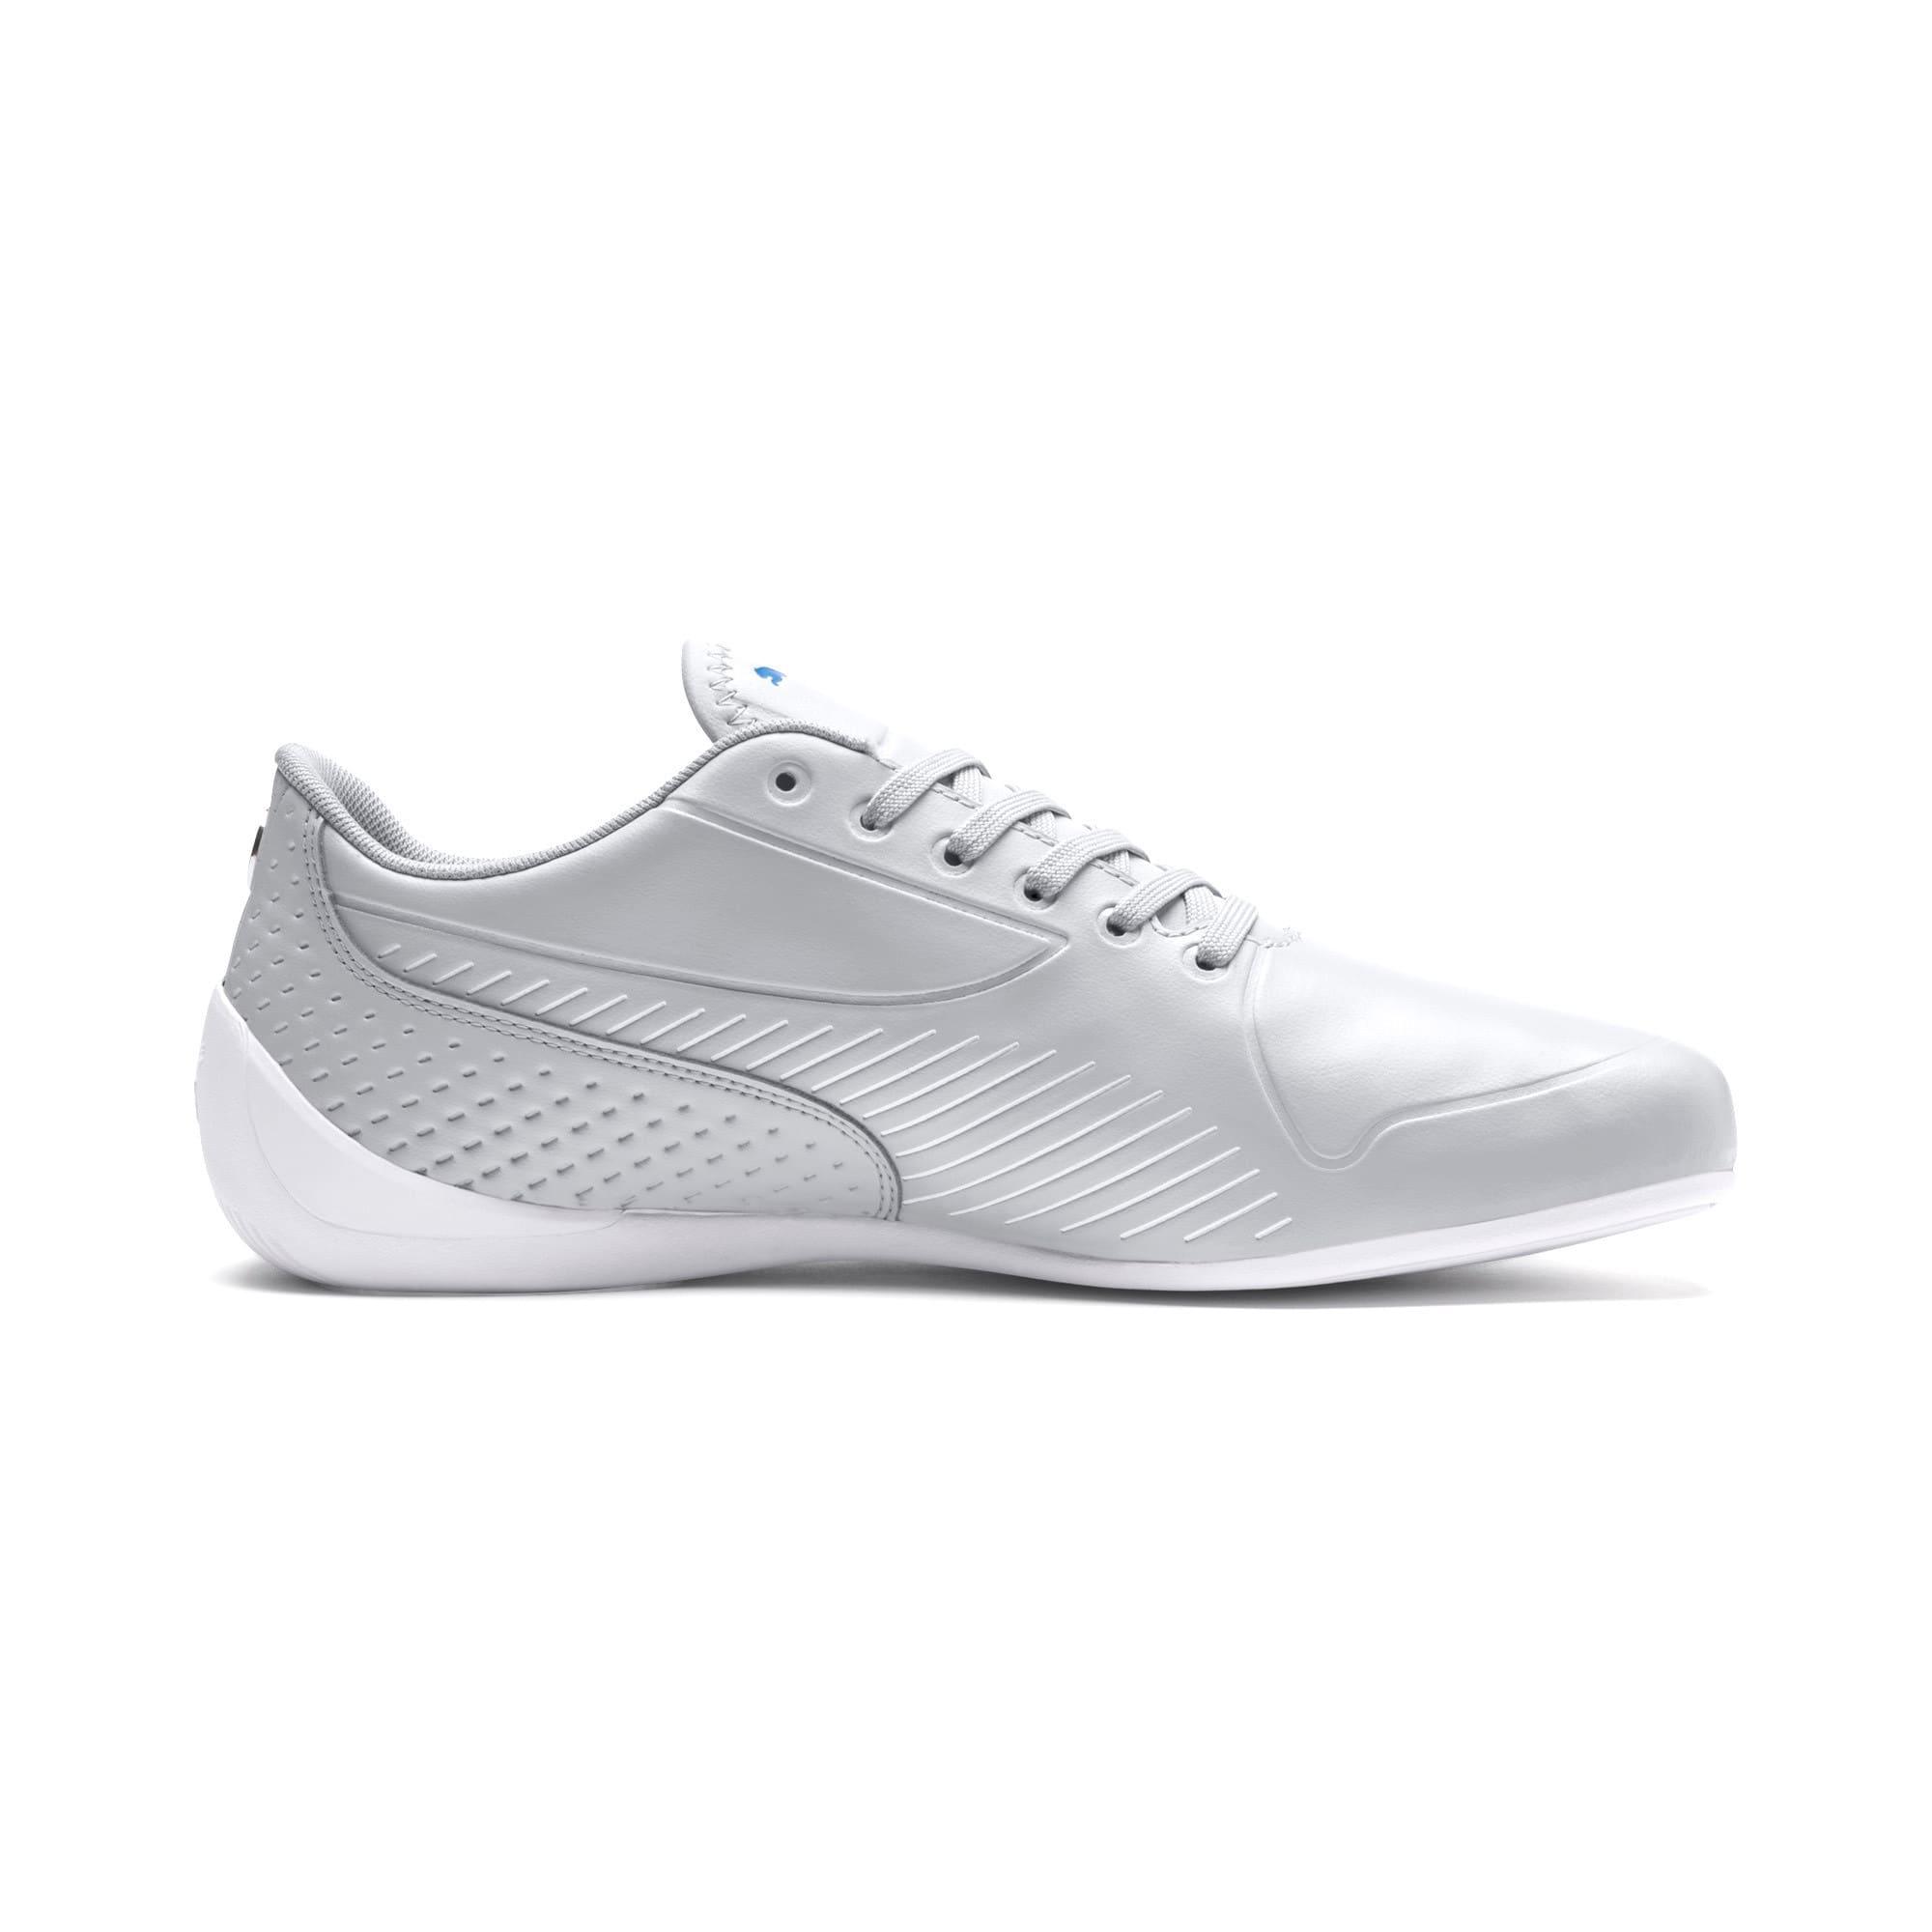 Thumbnail 5 of Mercedes AMG Petronas Drift Cat 7S Ultra Men's Shoes, Mercedes Team Silver-White, medium